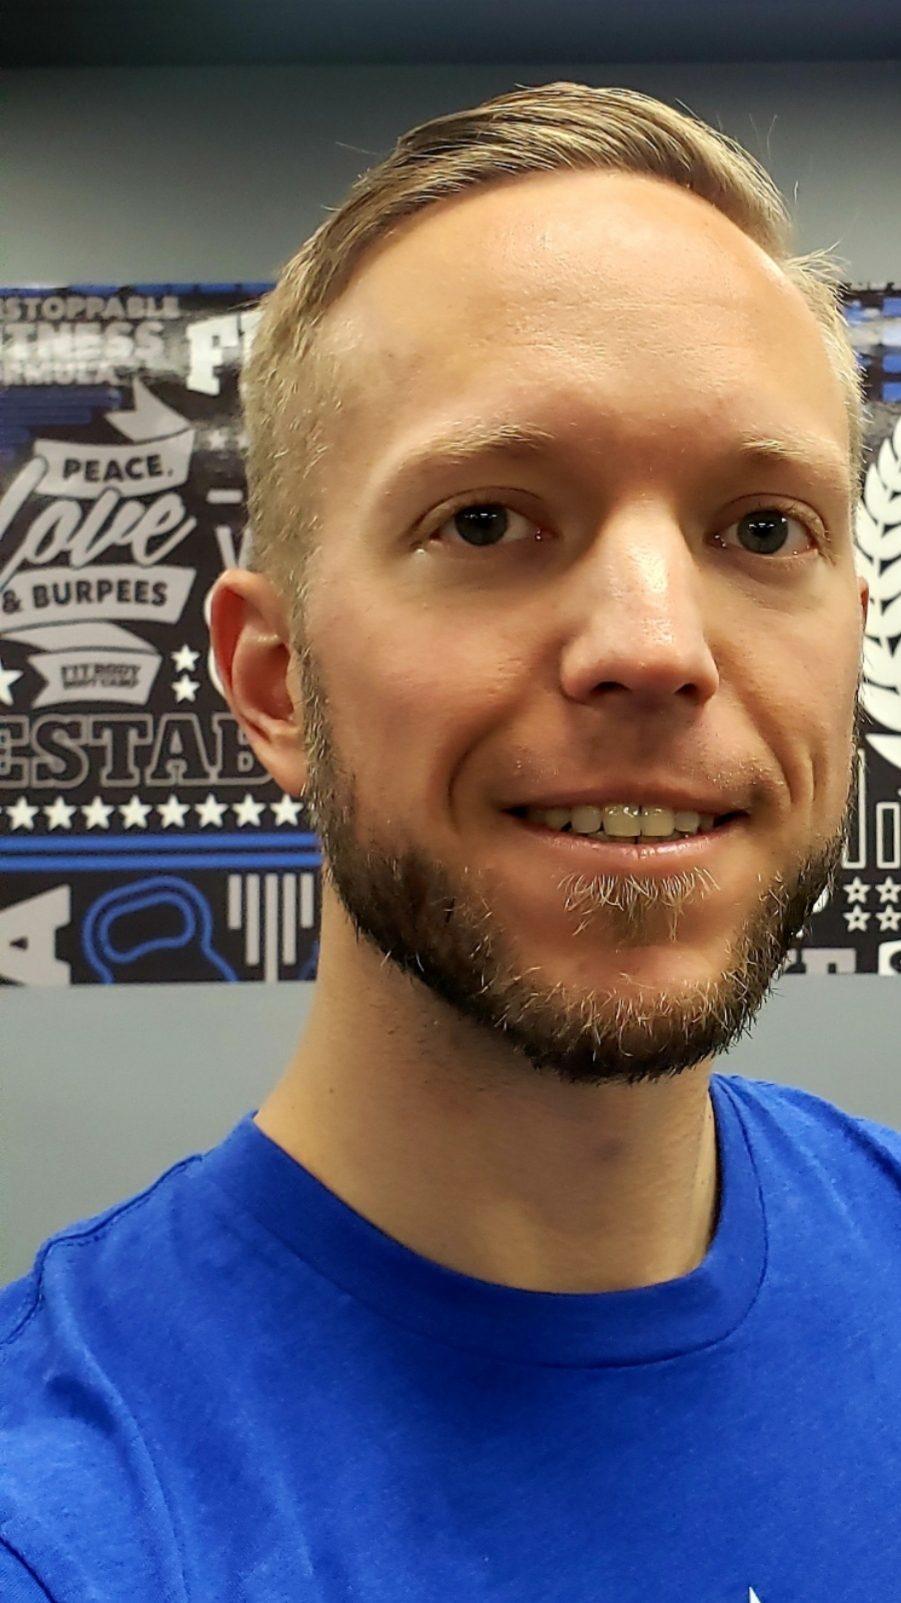 Personal Trainer Chicago, Illinois - Weston Gleffe